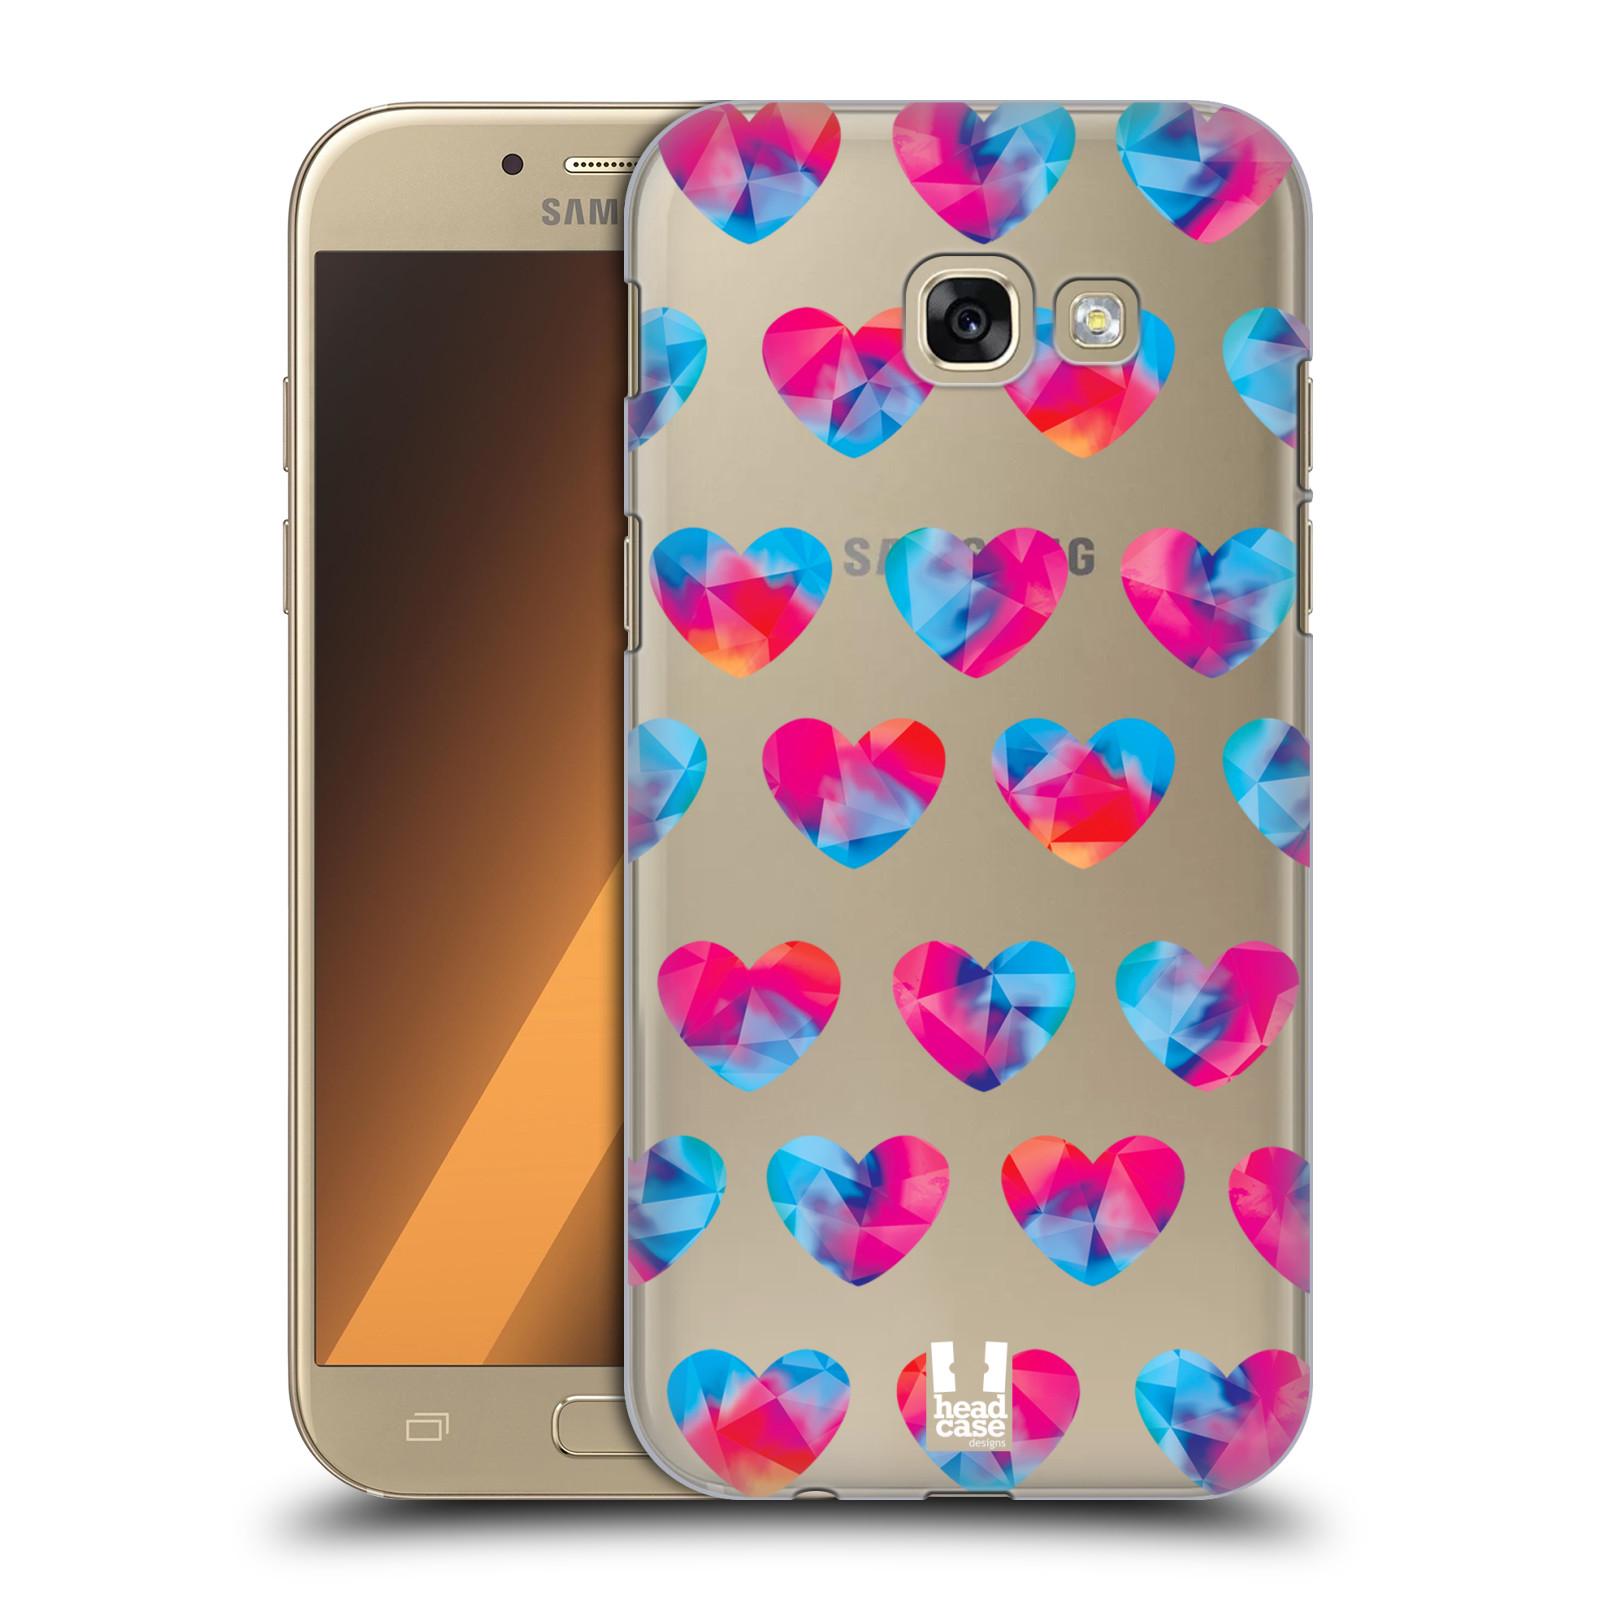 Plastové pouzdro na mobil Samsung Galaxy A5 (2017) - Head Case - Srdíčka hrající barvami